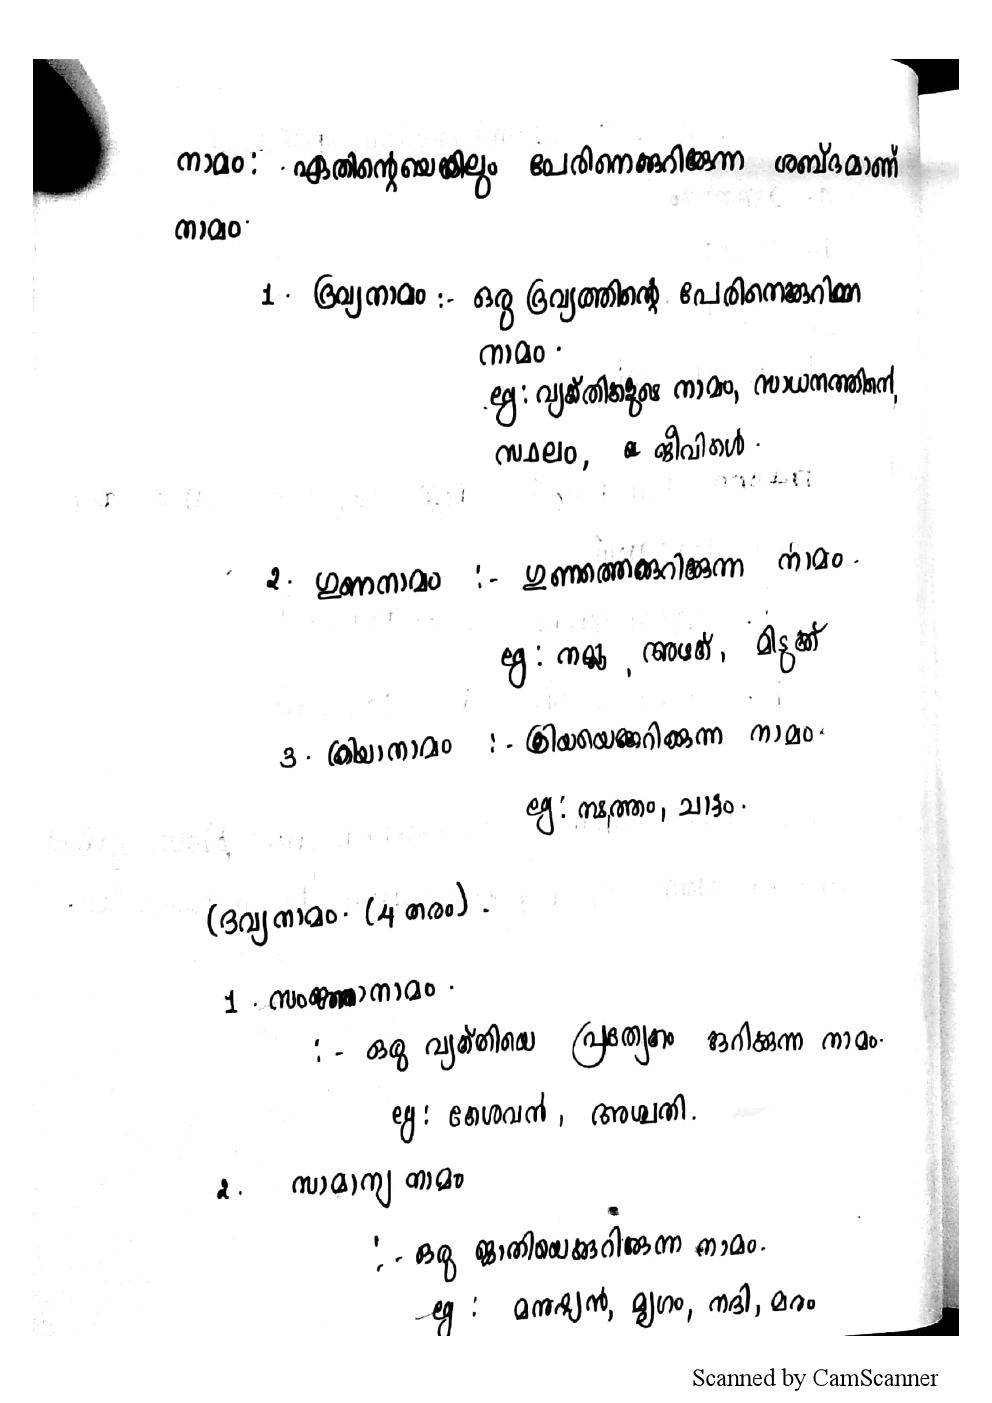 http://masterstudy.net/pdf/ktet_notes0093.png